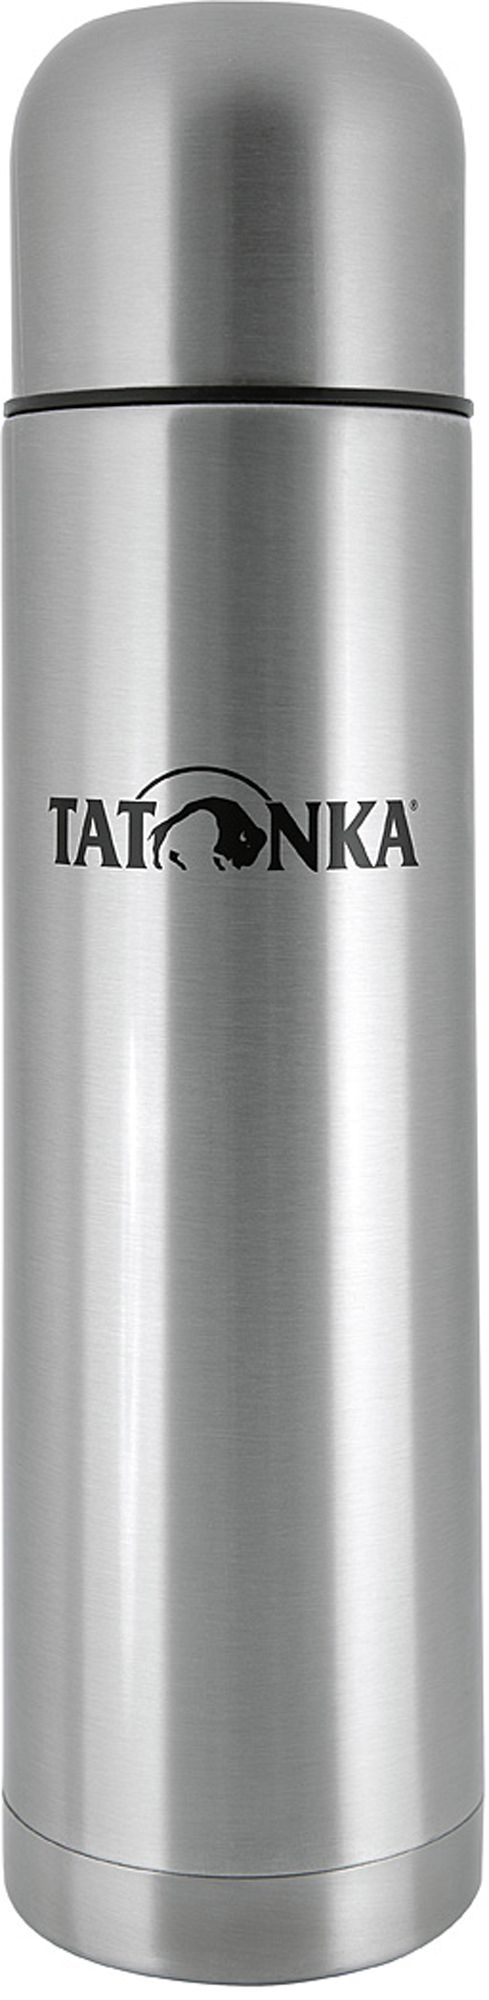 цена на Tatonka Термос Tatonka 0,7 л